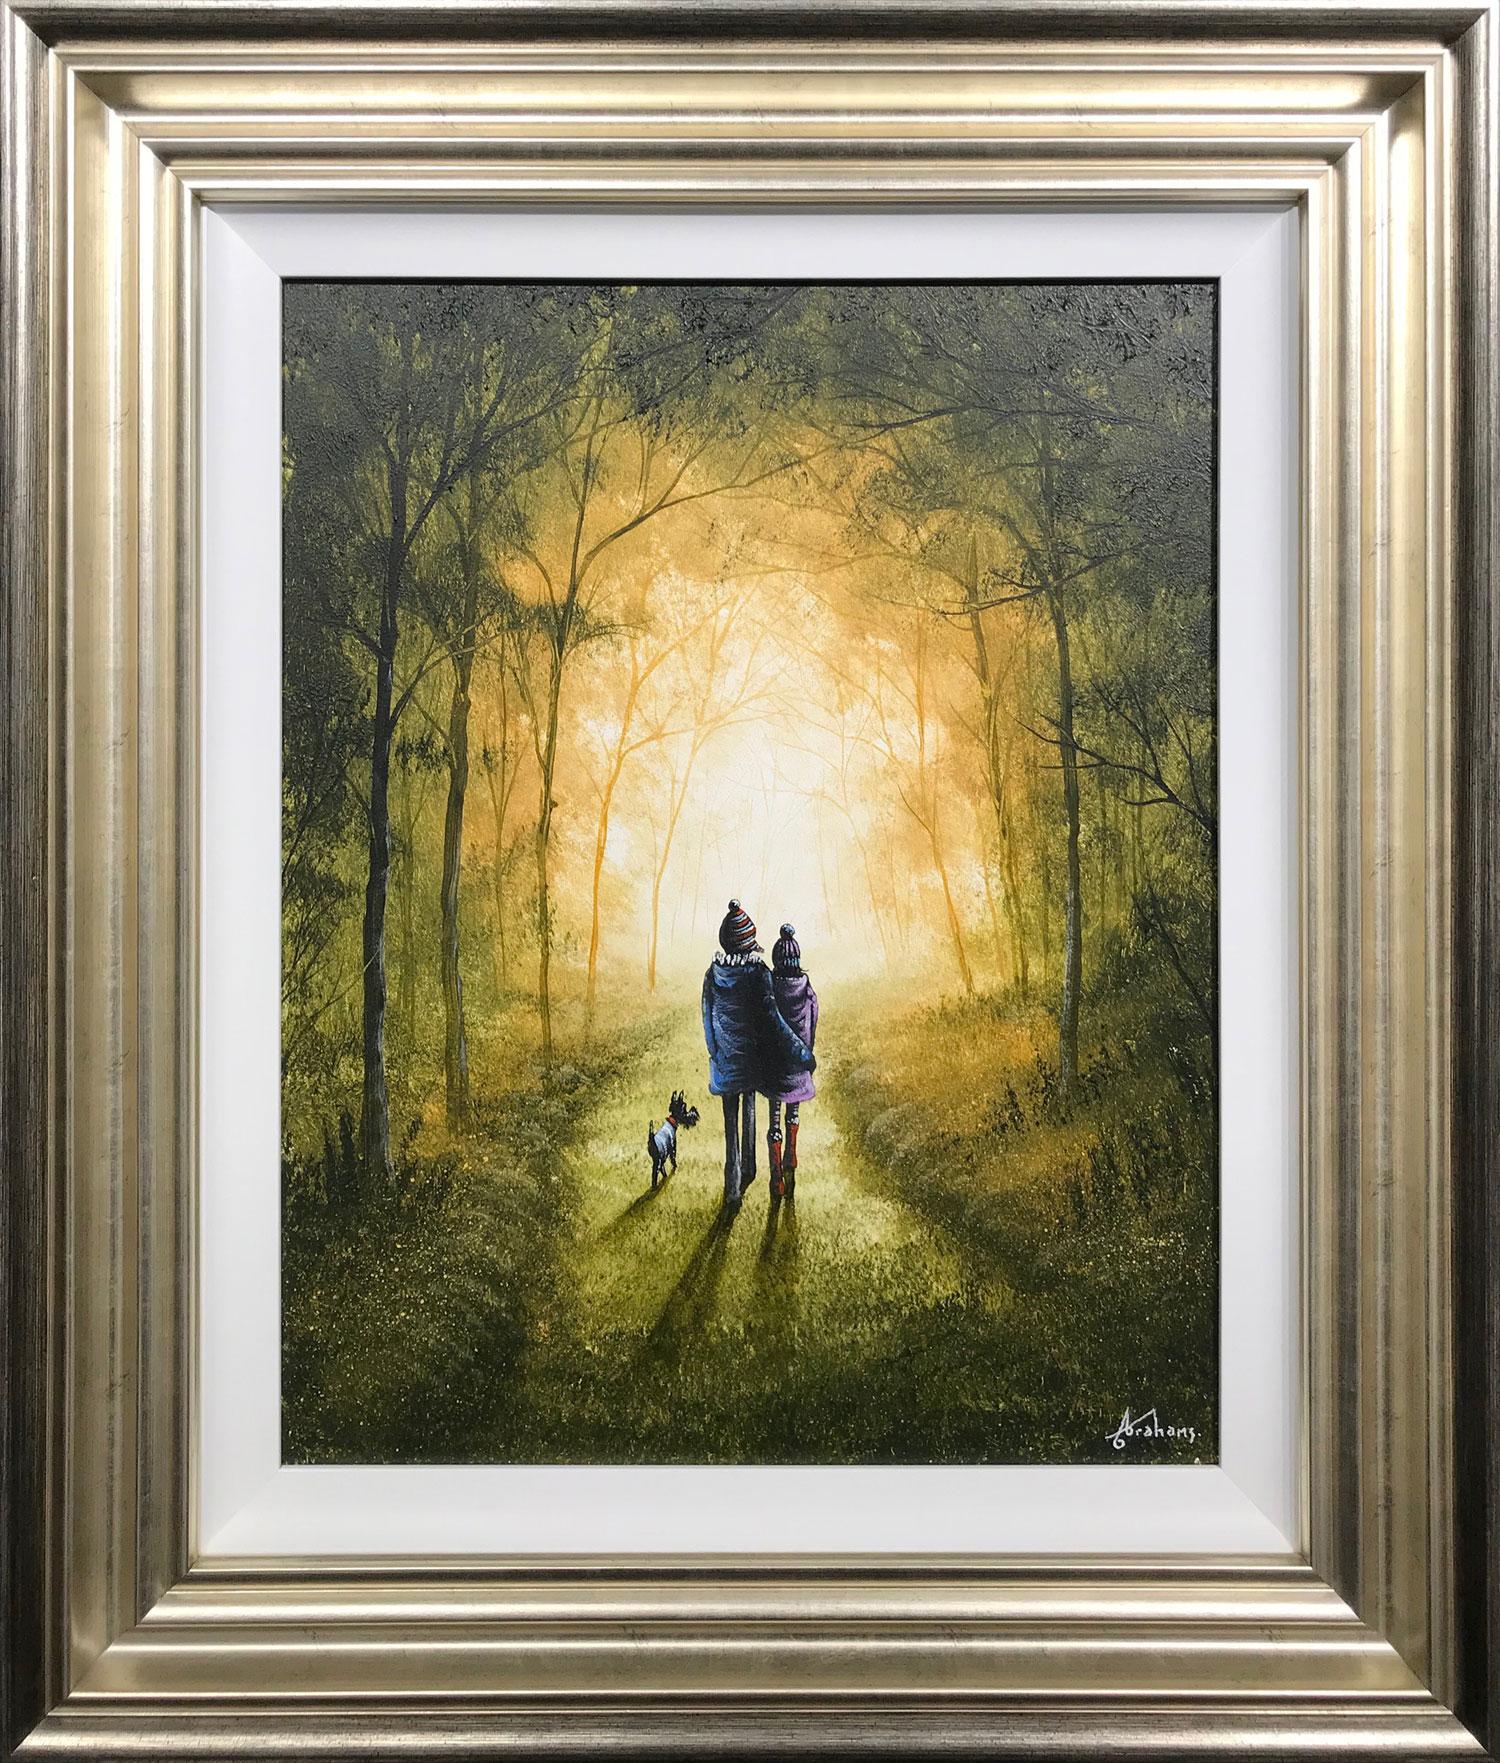 Danny Abrahams Original Painting Never Been Happier